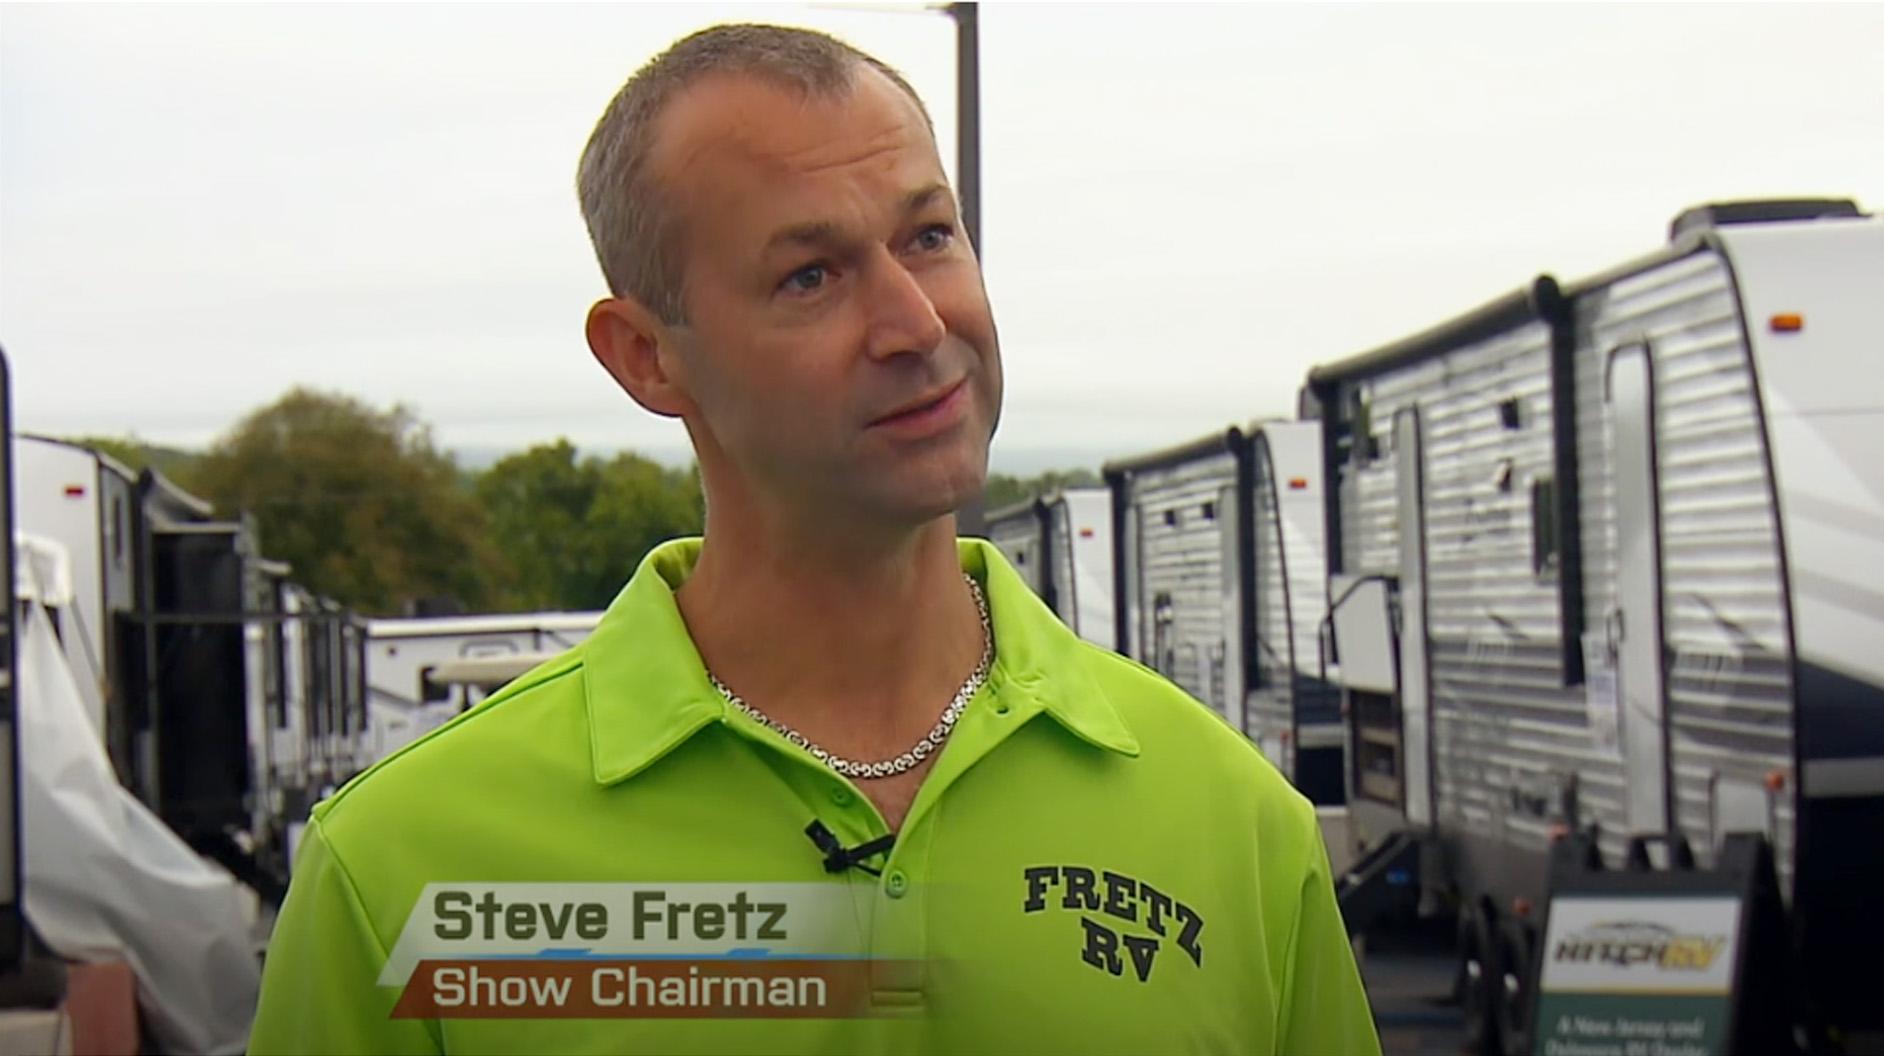 Steve Fretz, Fretz RV, America's Largest RV Show Chairman